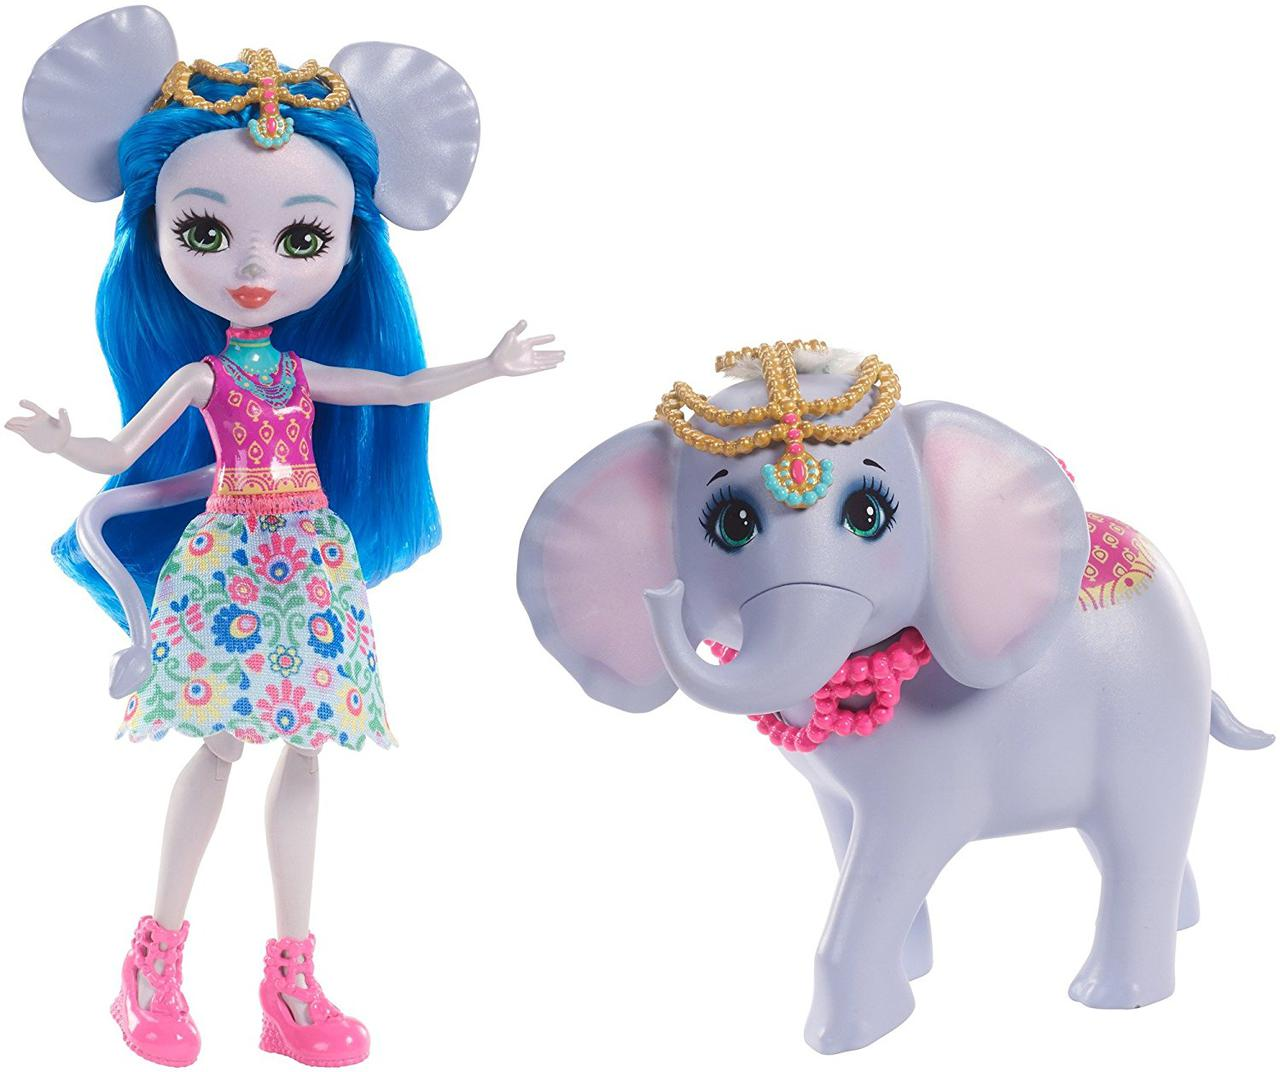 Кукла Энчантималс Слоник Екатерина и друг Антик Enchantimals Ekaterina Elephant Dolls with Antic